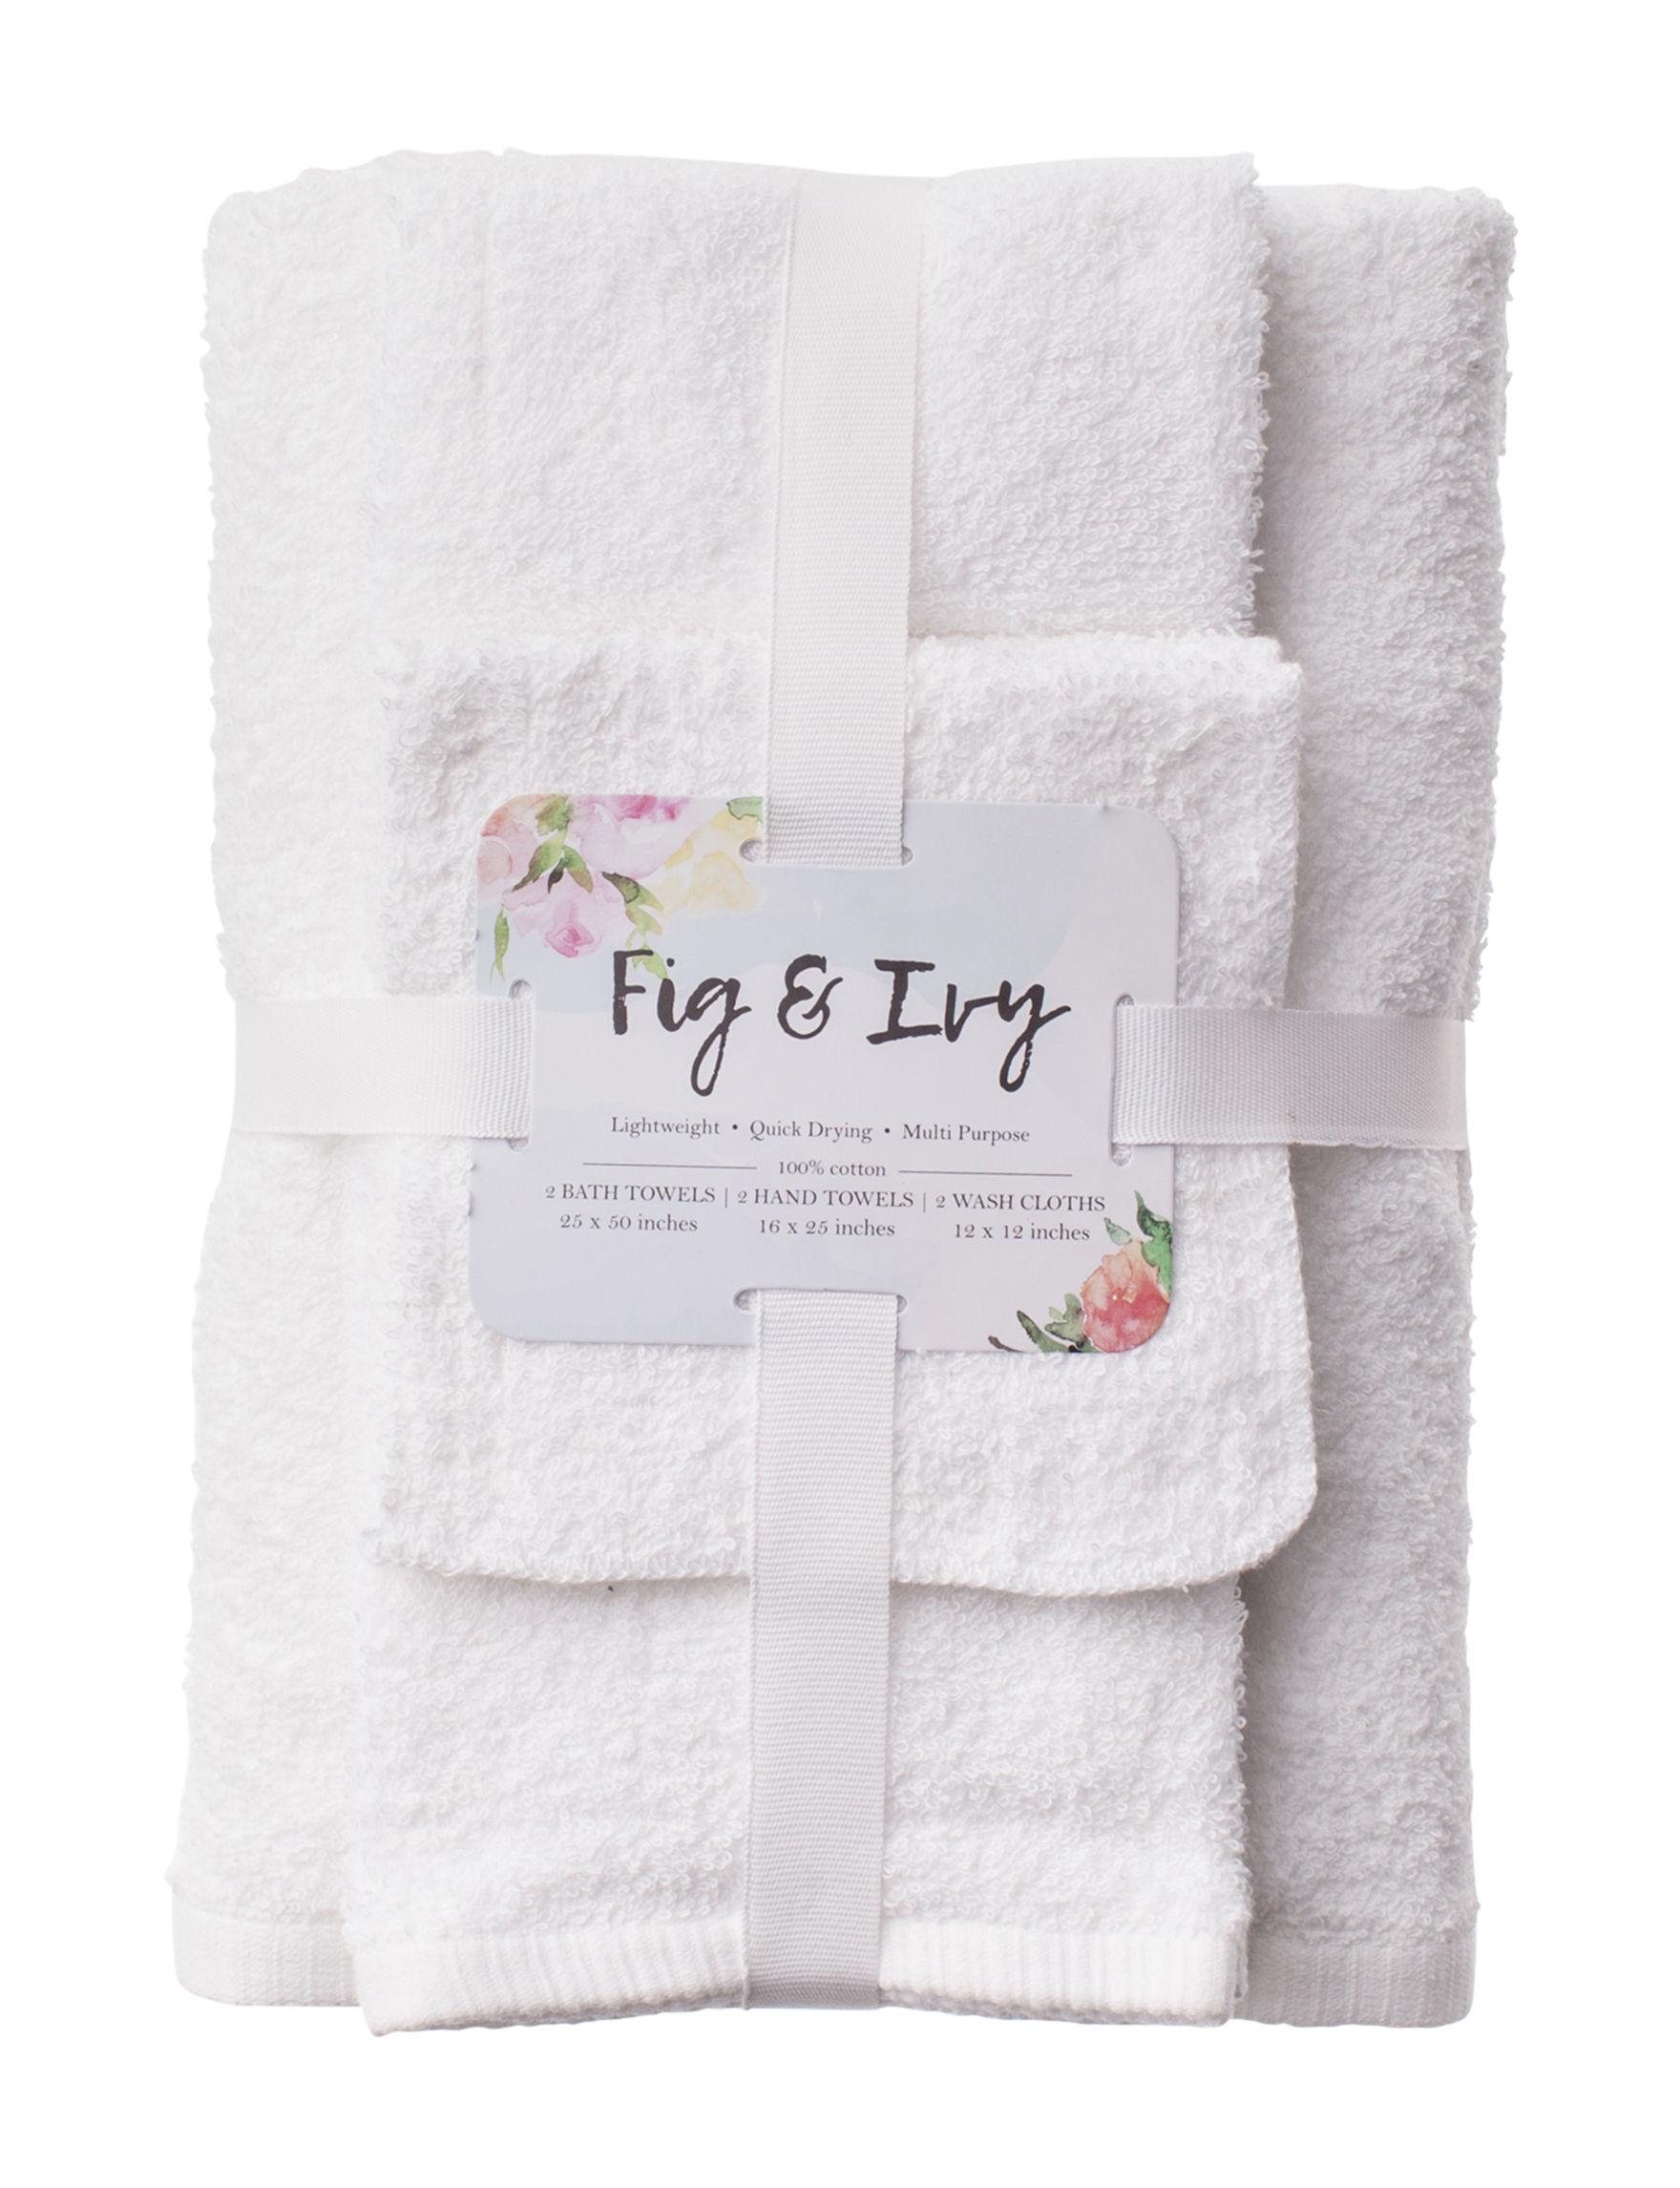 Fig & Ivy White Bath Towels Hand Towels Washcloths Towels